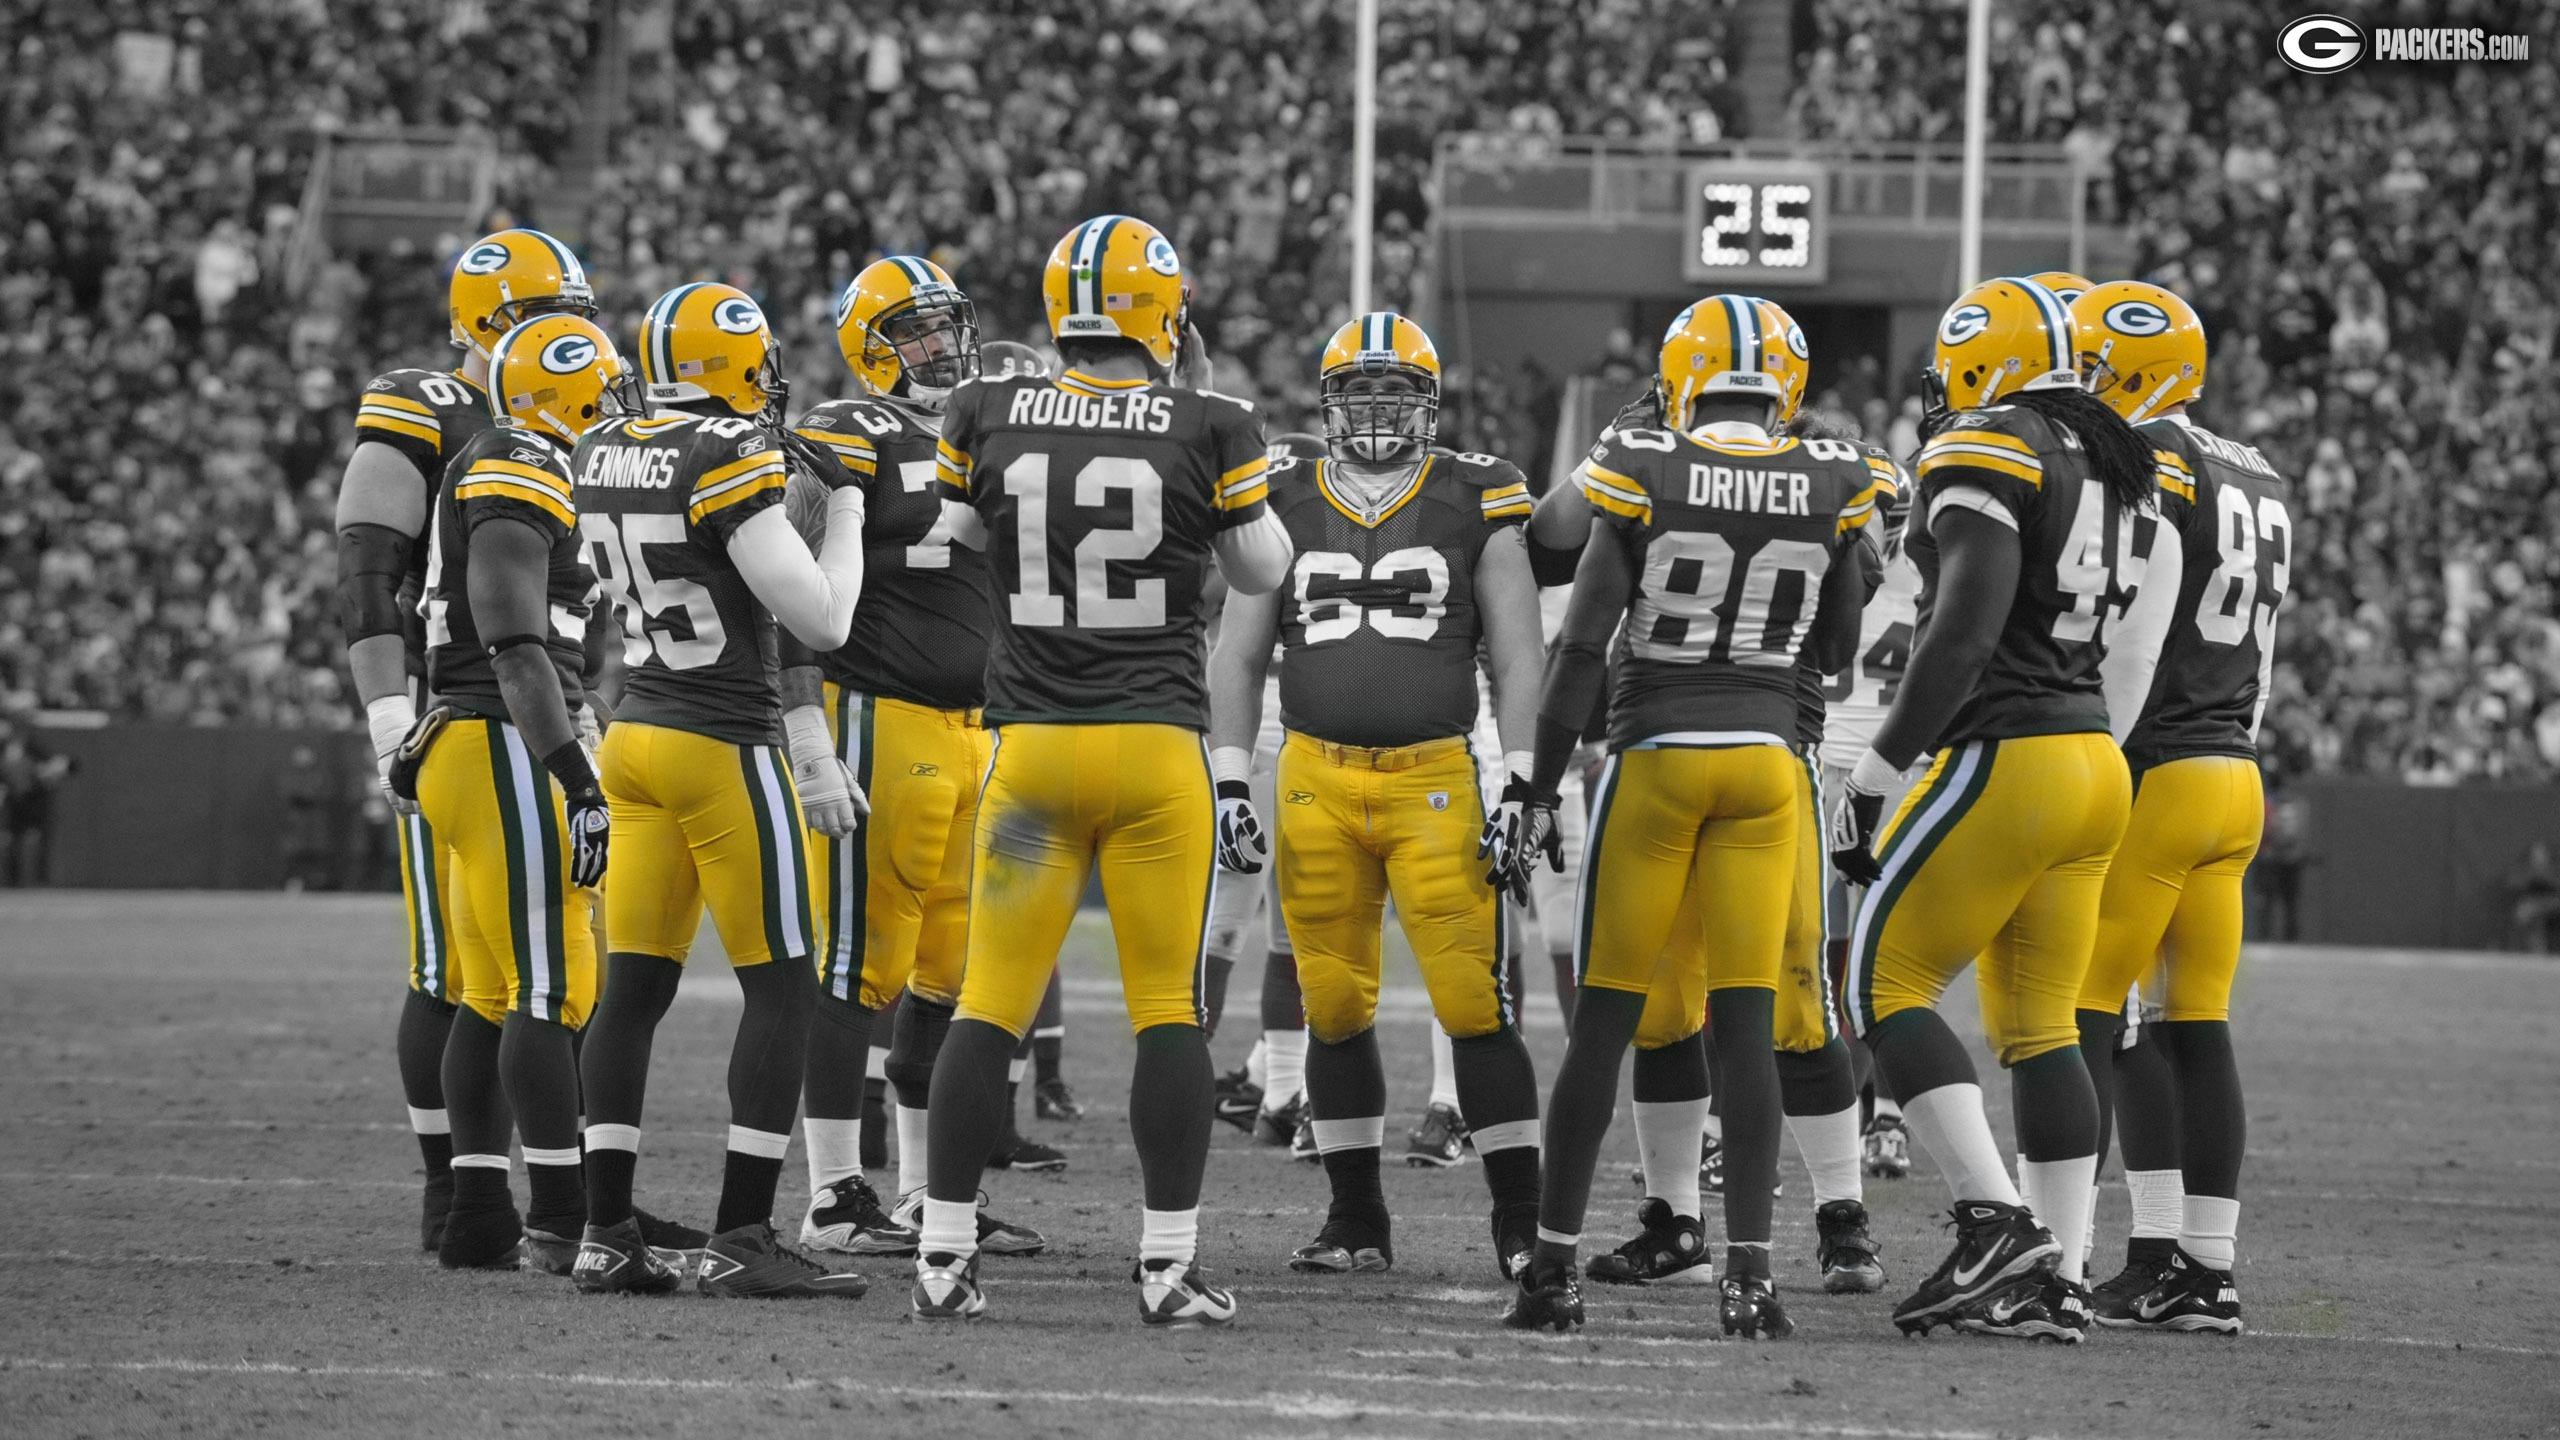 NFL Team Desktop Wallpaper 2560x1440